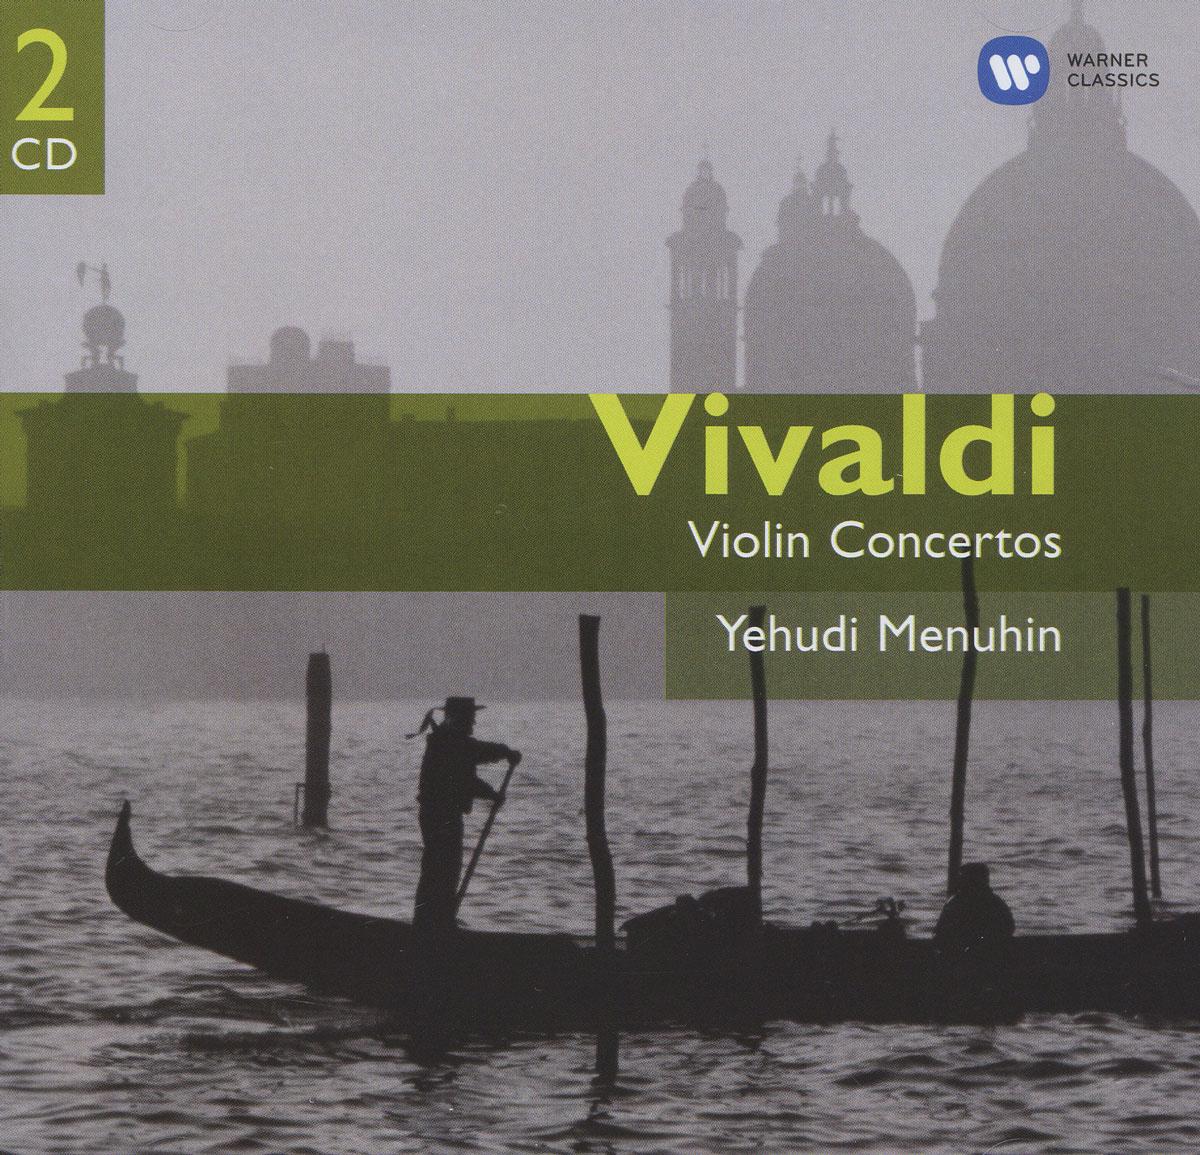 Иегуди Менухин,Polish Chamber Orchestra Vivaldi. Violin Concertos. Yehudi Menuhin (2 CD)